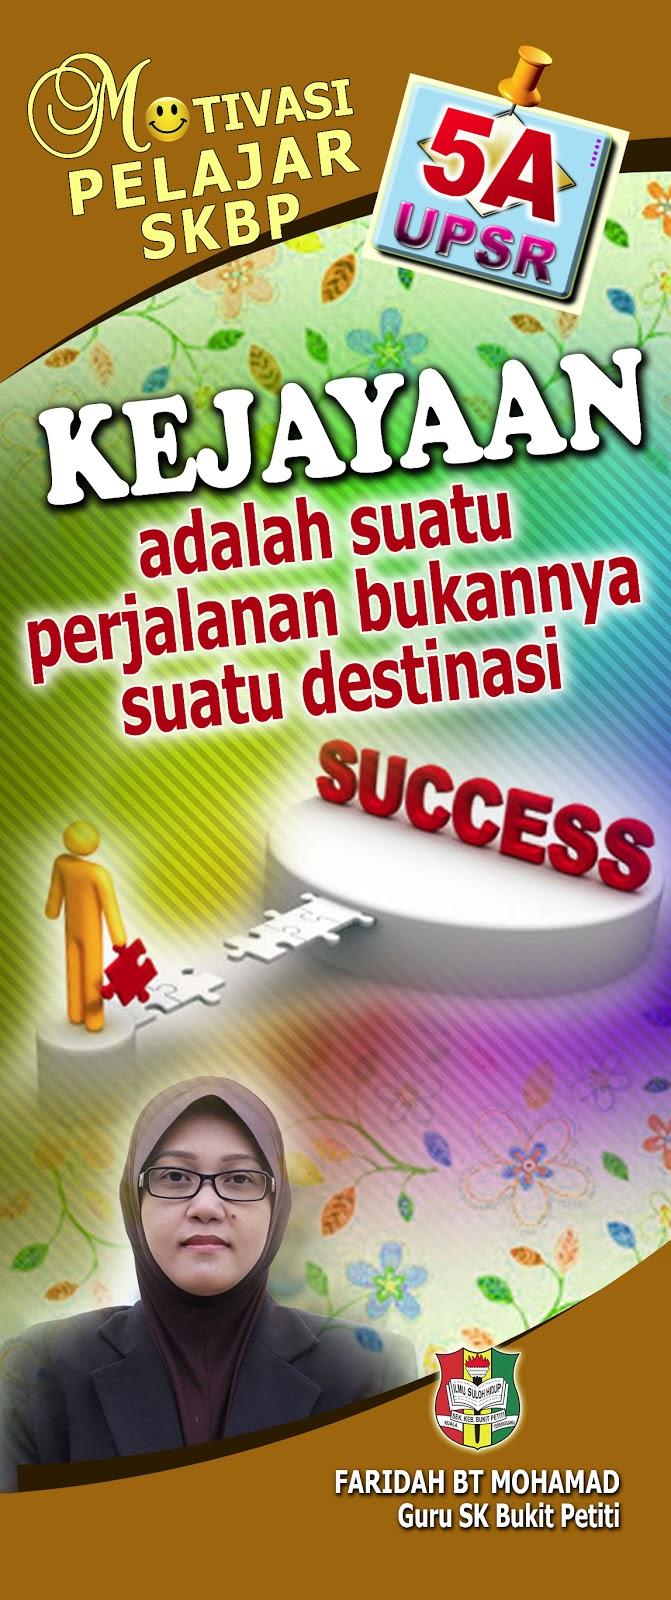 SK BUKIT PETITI  Kuala Terengganu: Banner Motivasi